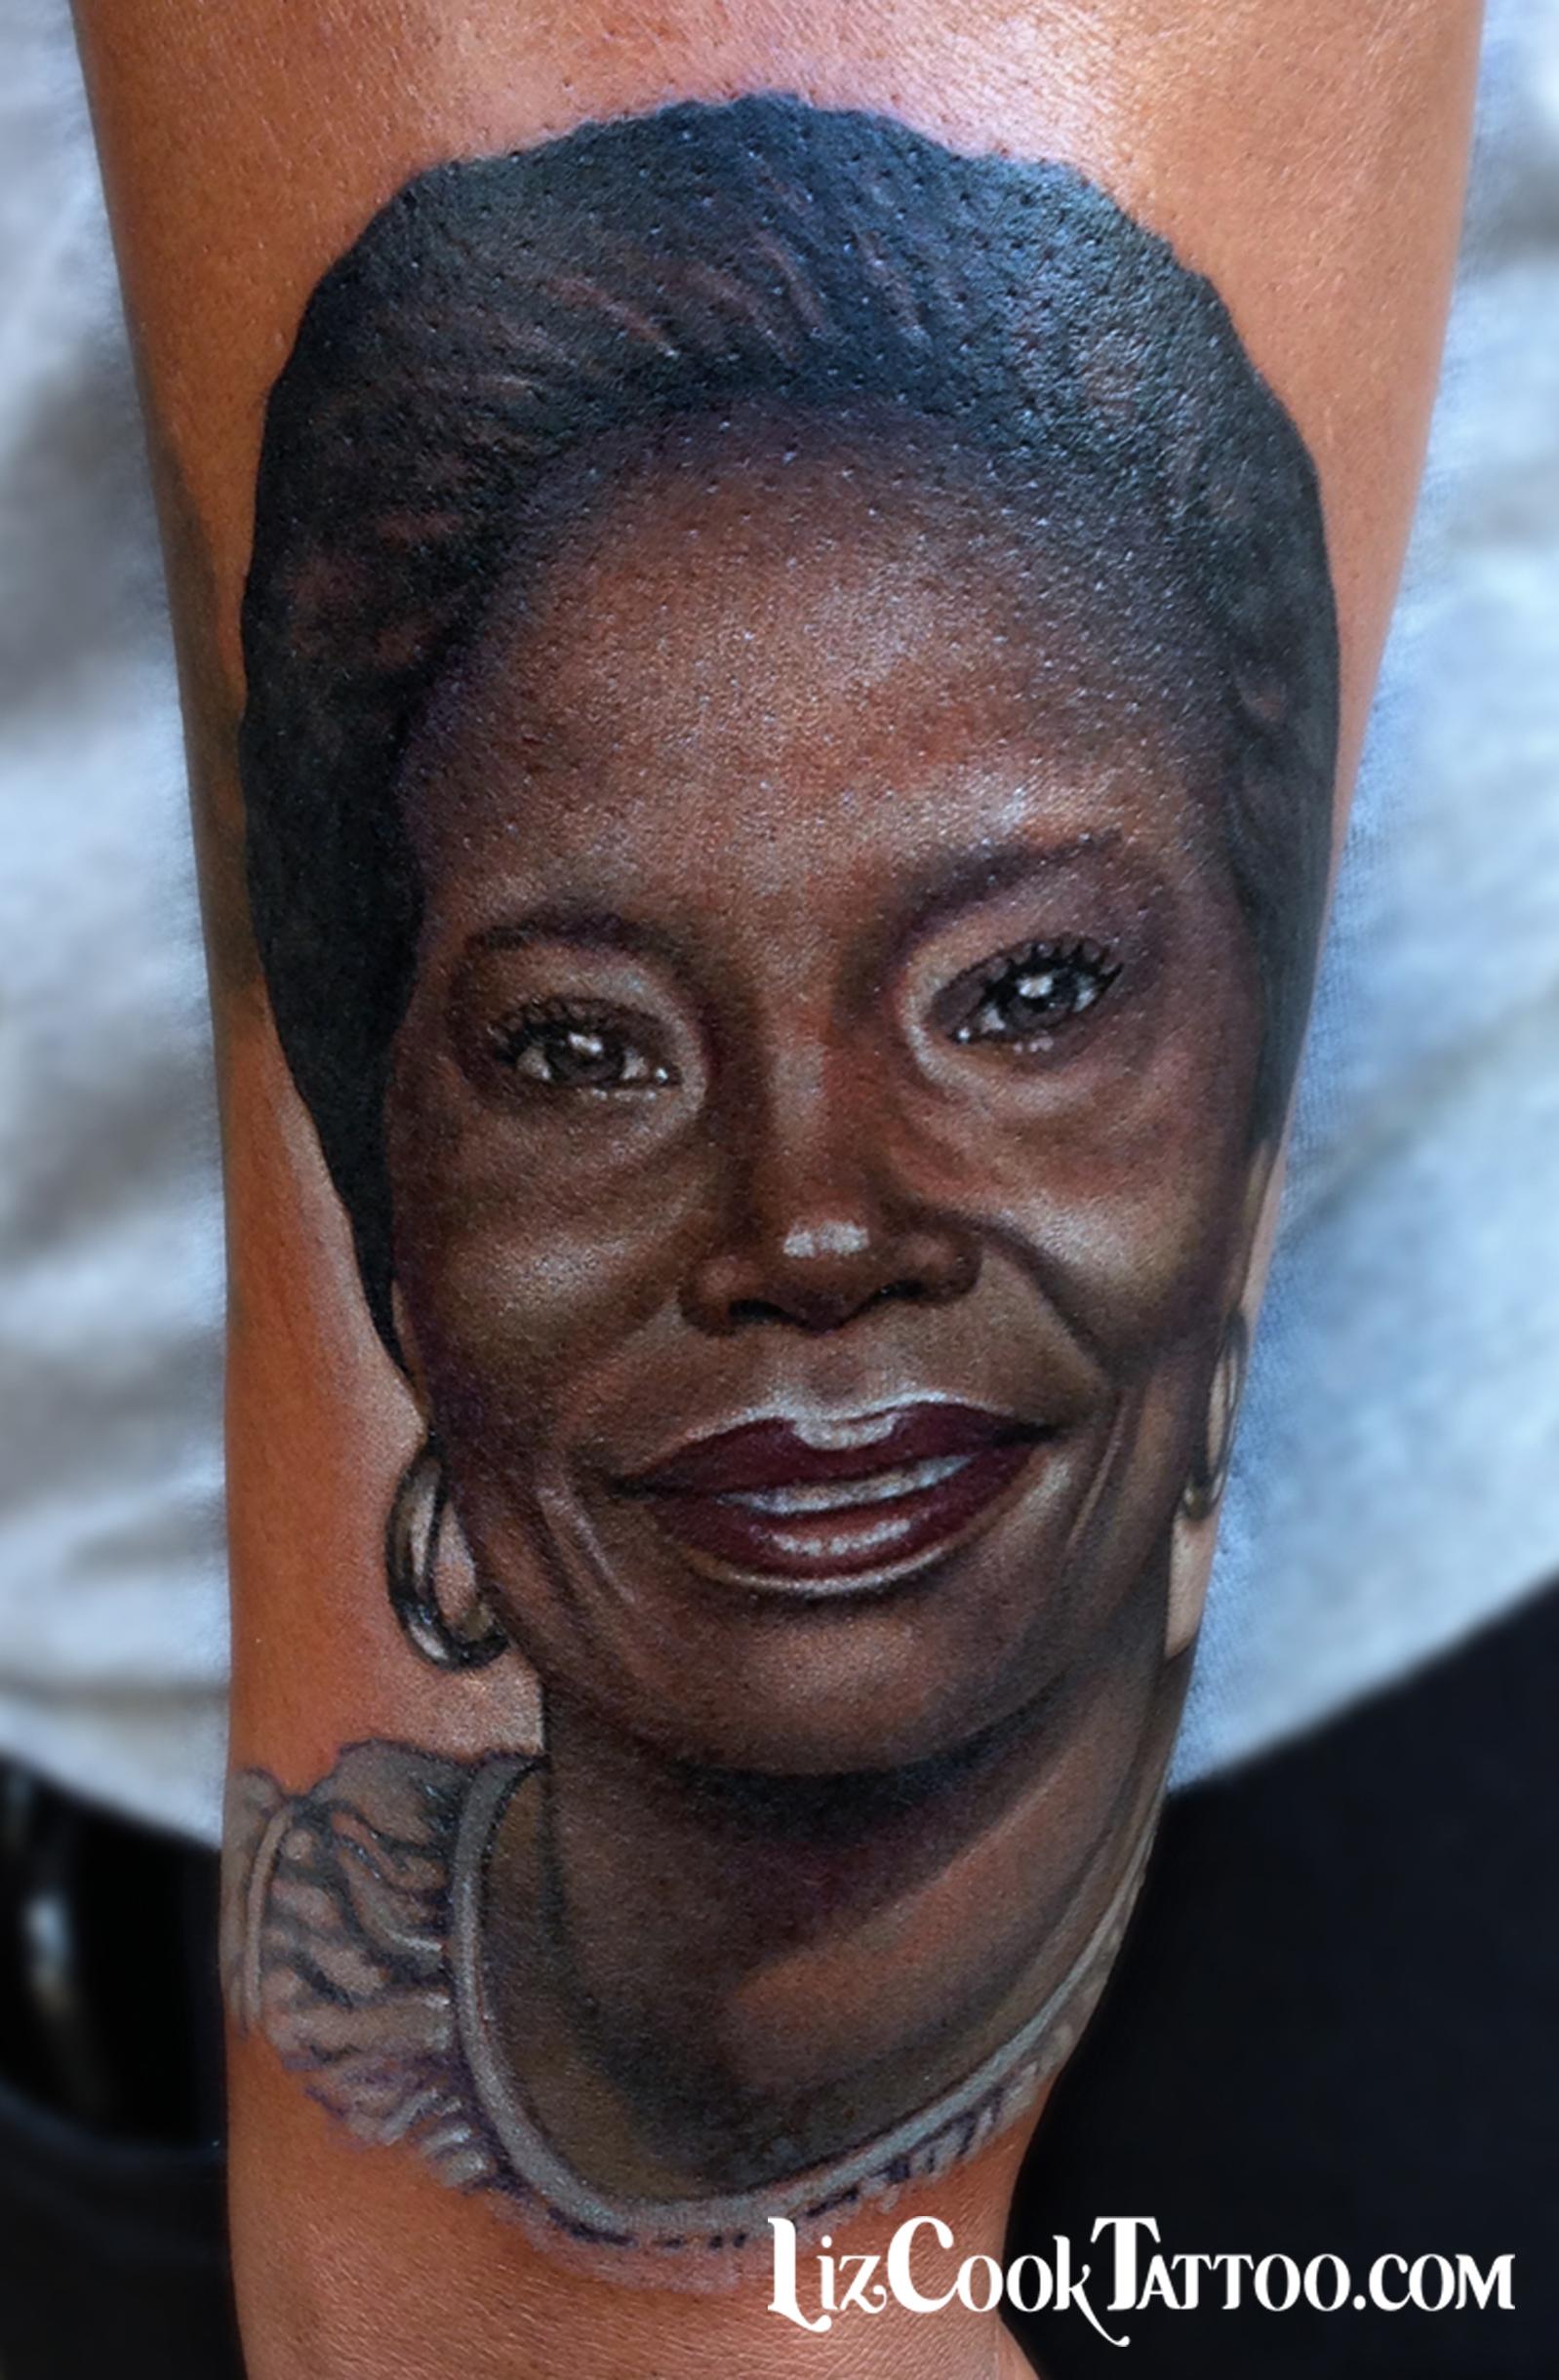 Liz Cook Tattoo Portrait Grandma Color Realism Dark Skin.jpg